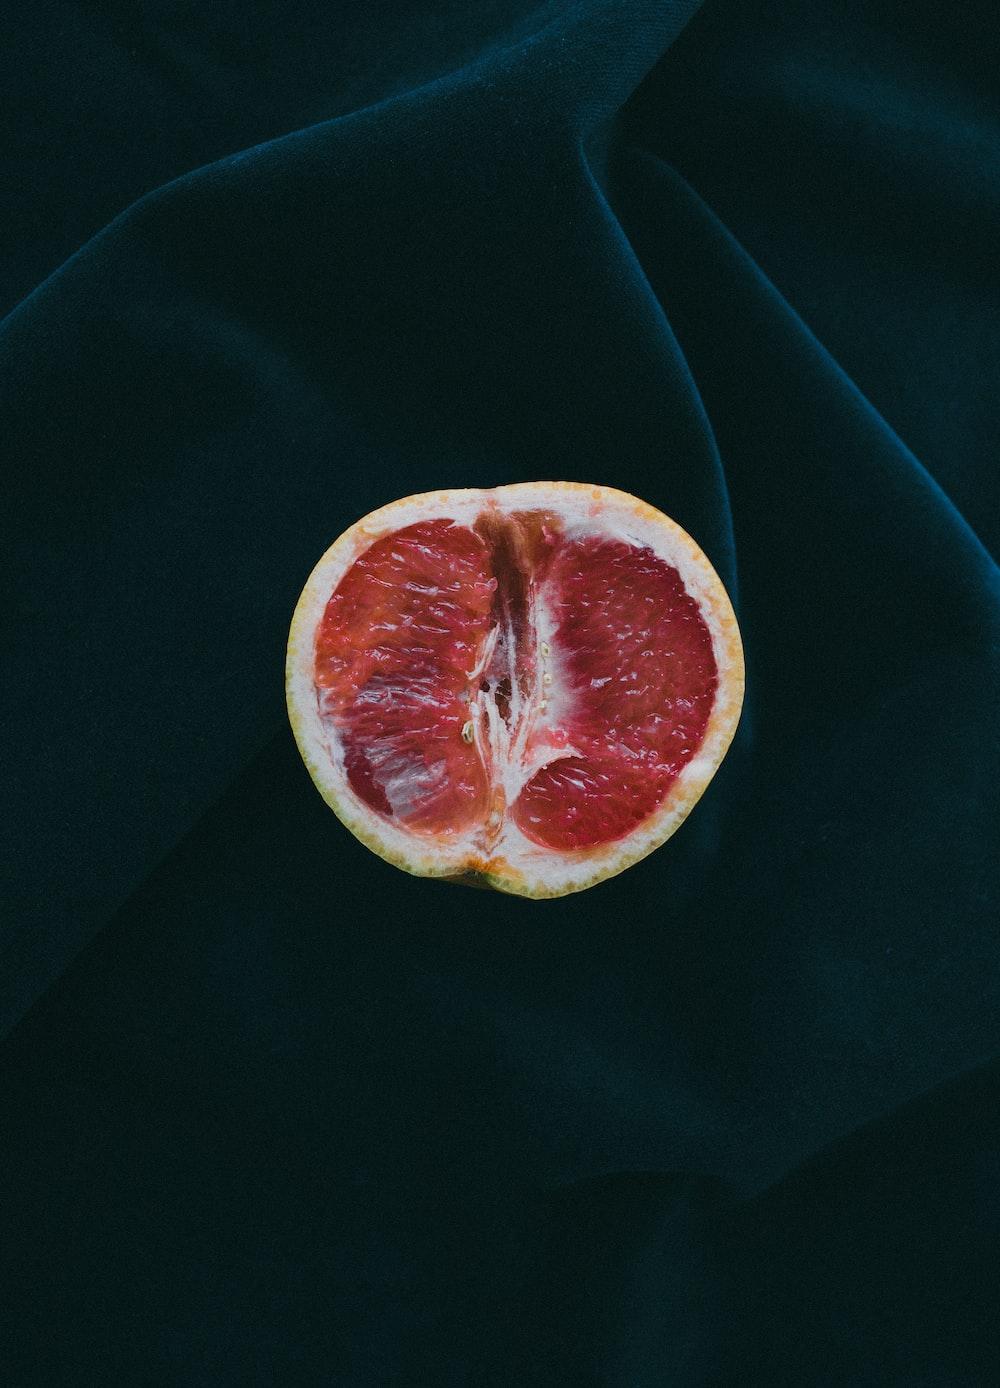 grapefruit on black surface